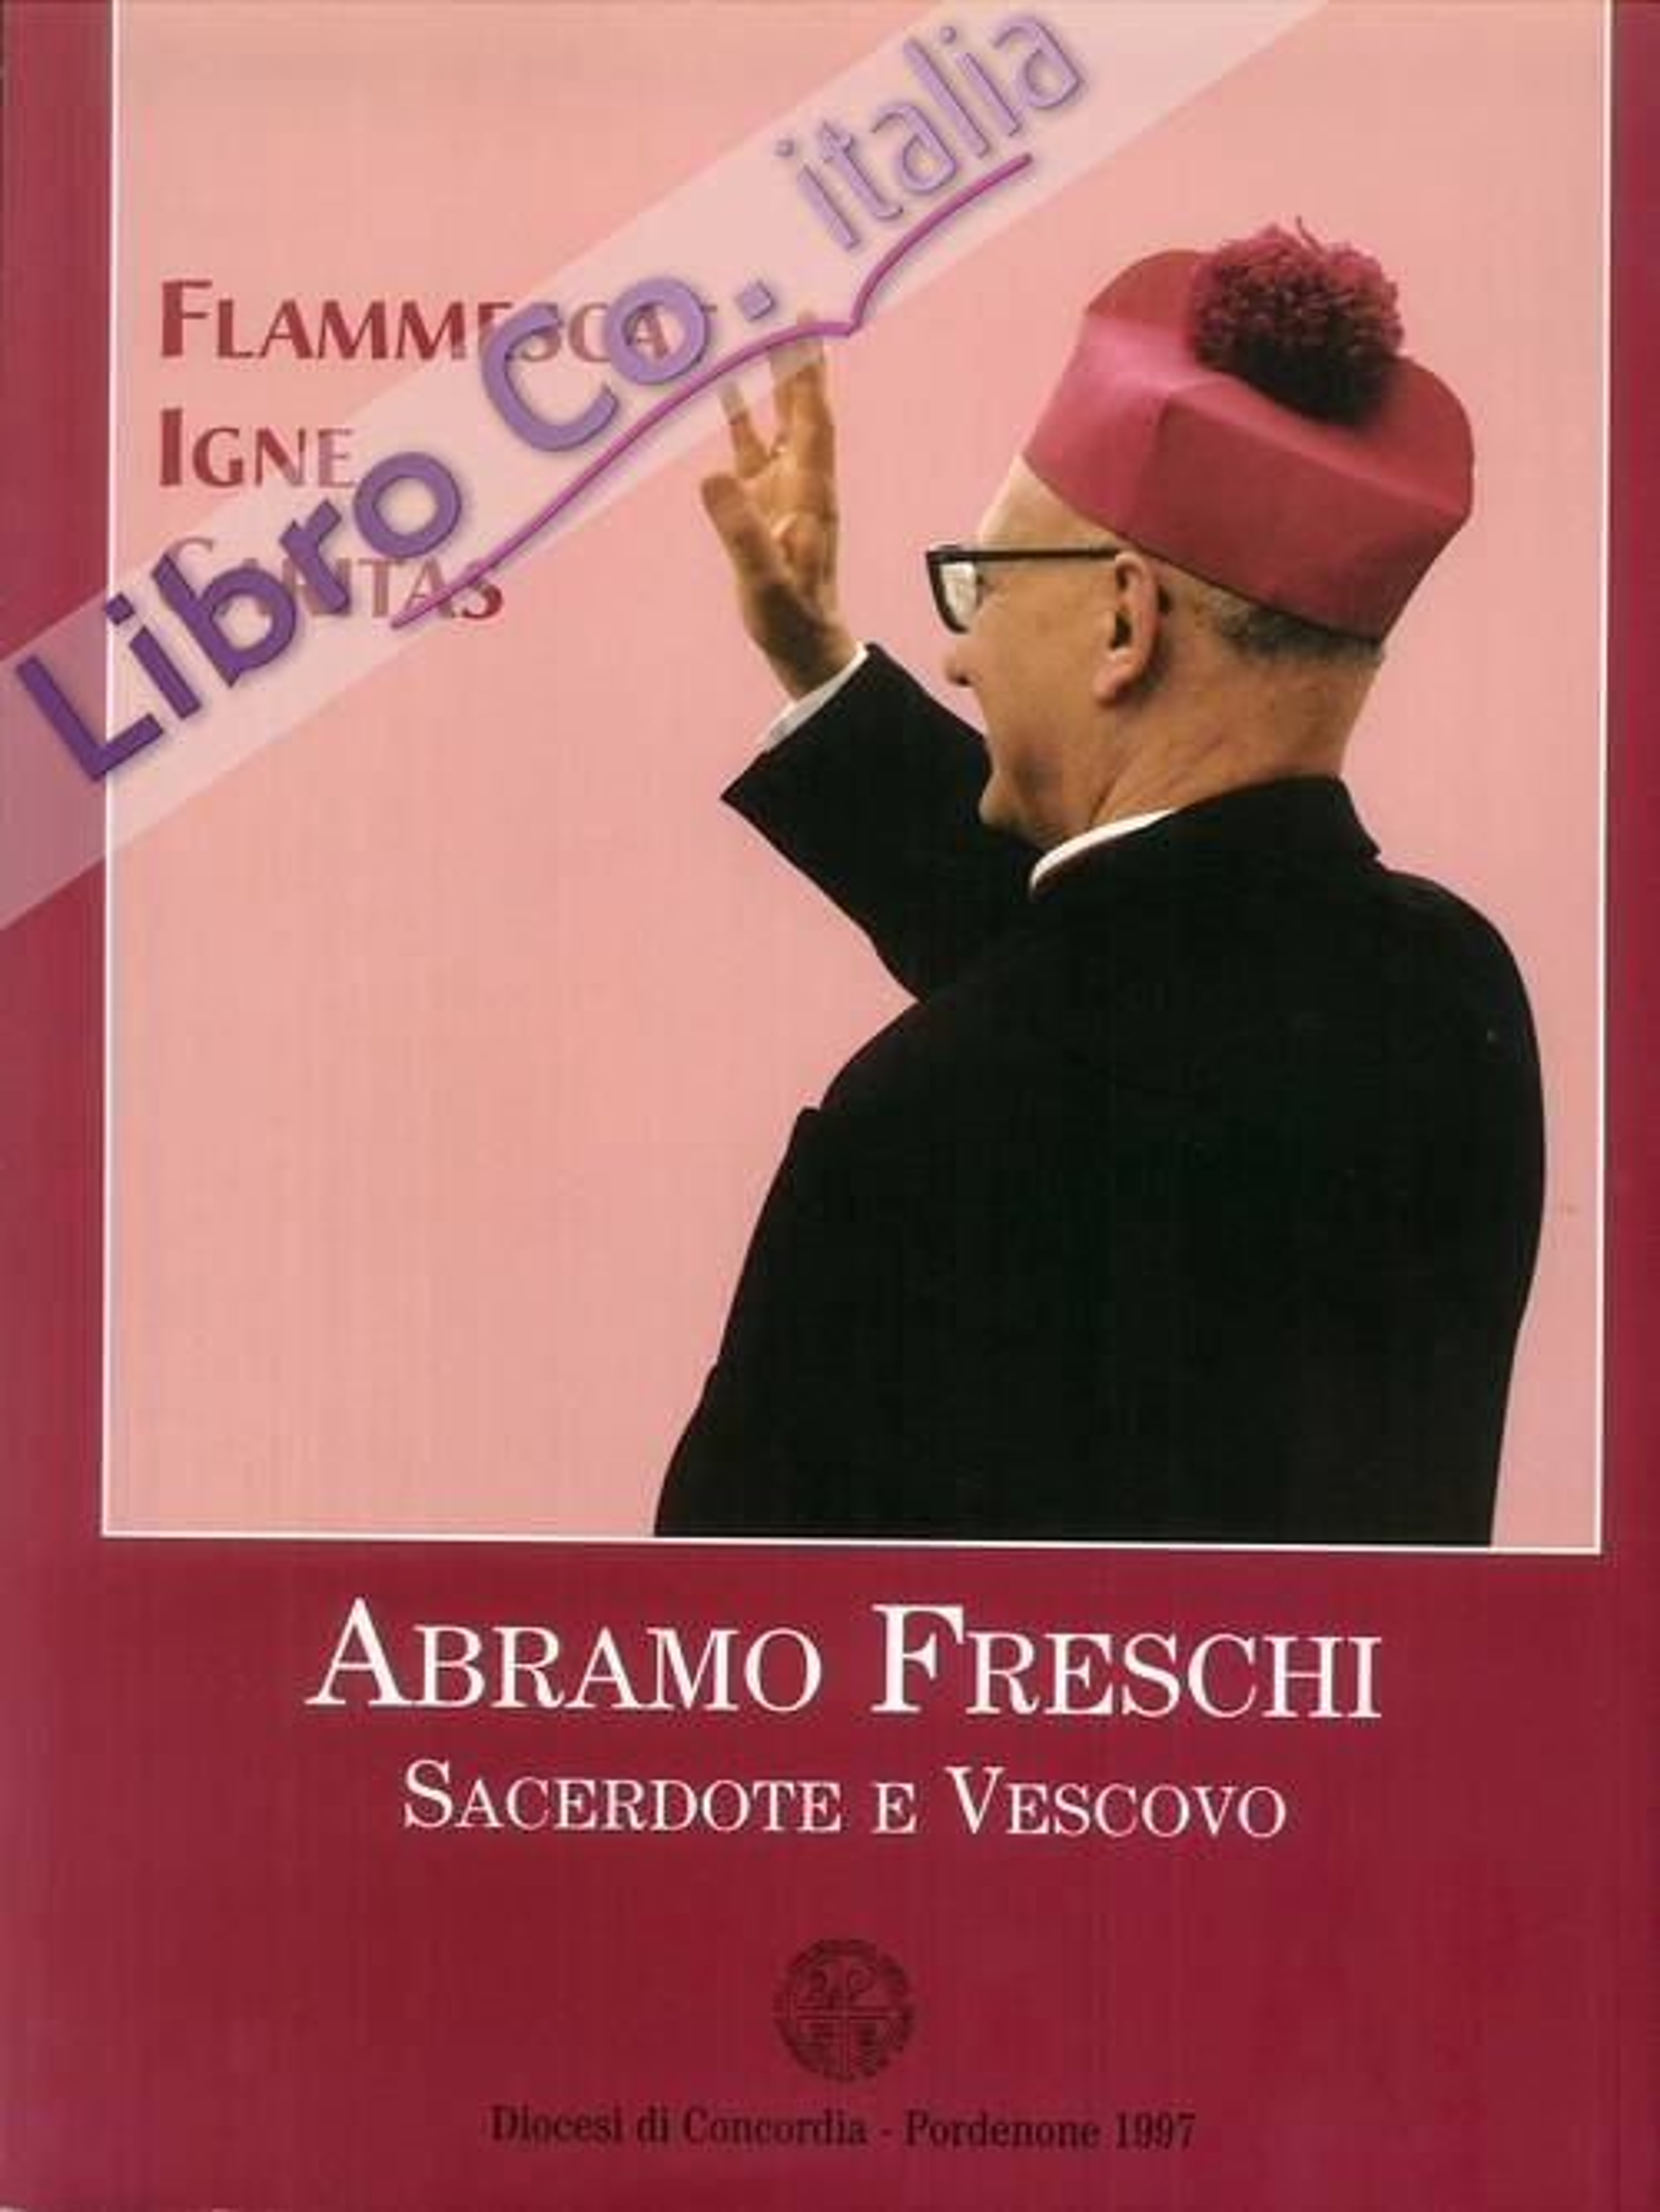 Abramo Freschi sacerdote e vescovo